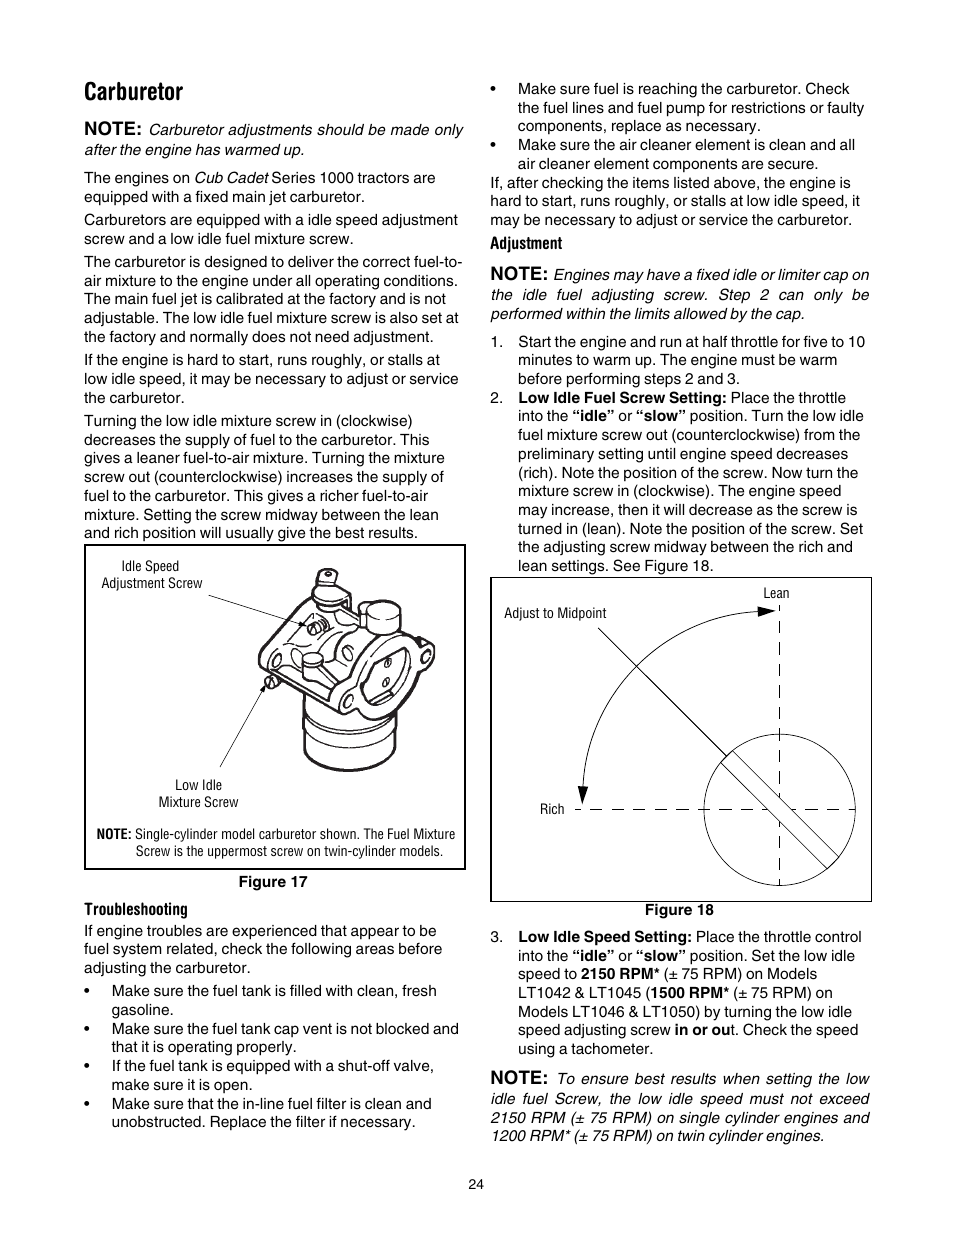 Cub Cadet Carb Diagram | Wiring Diagram